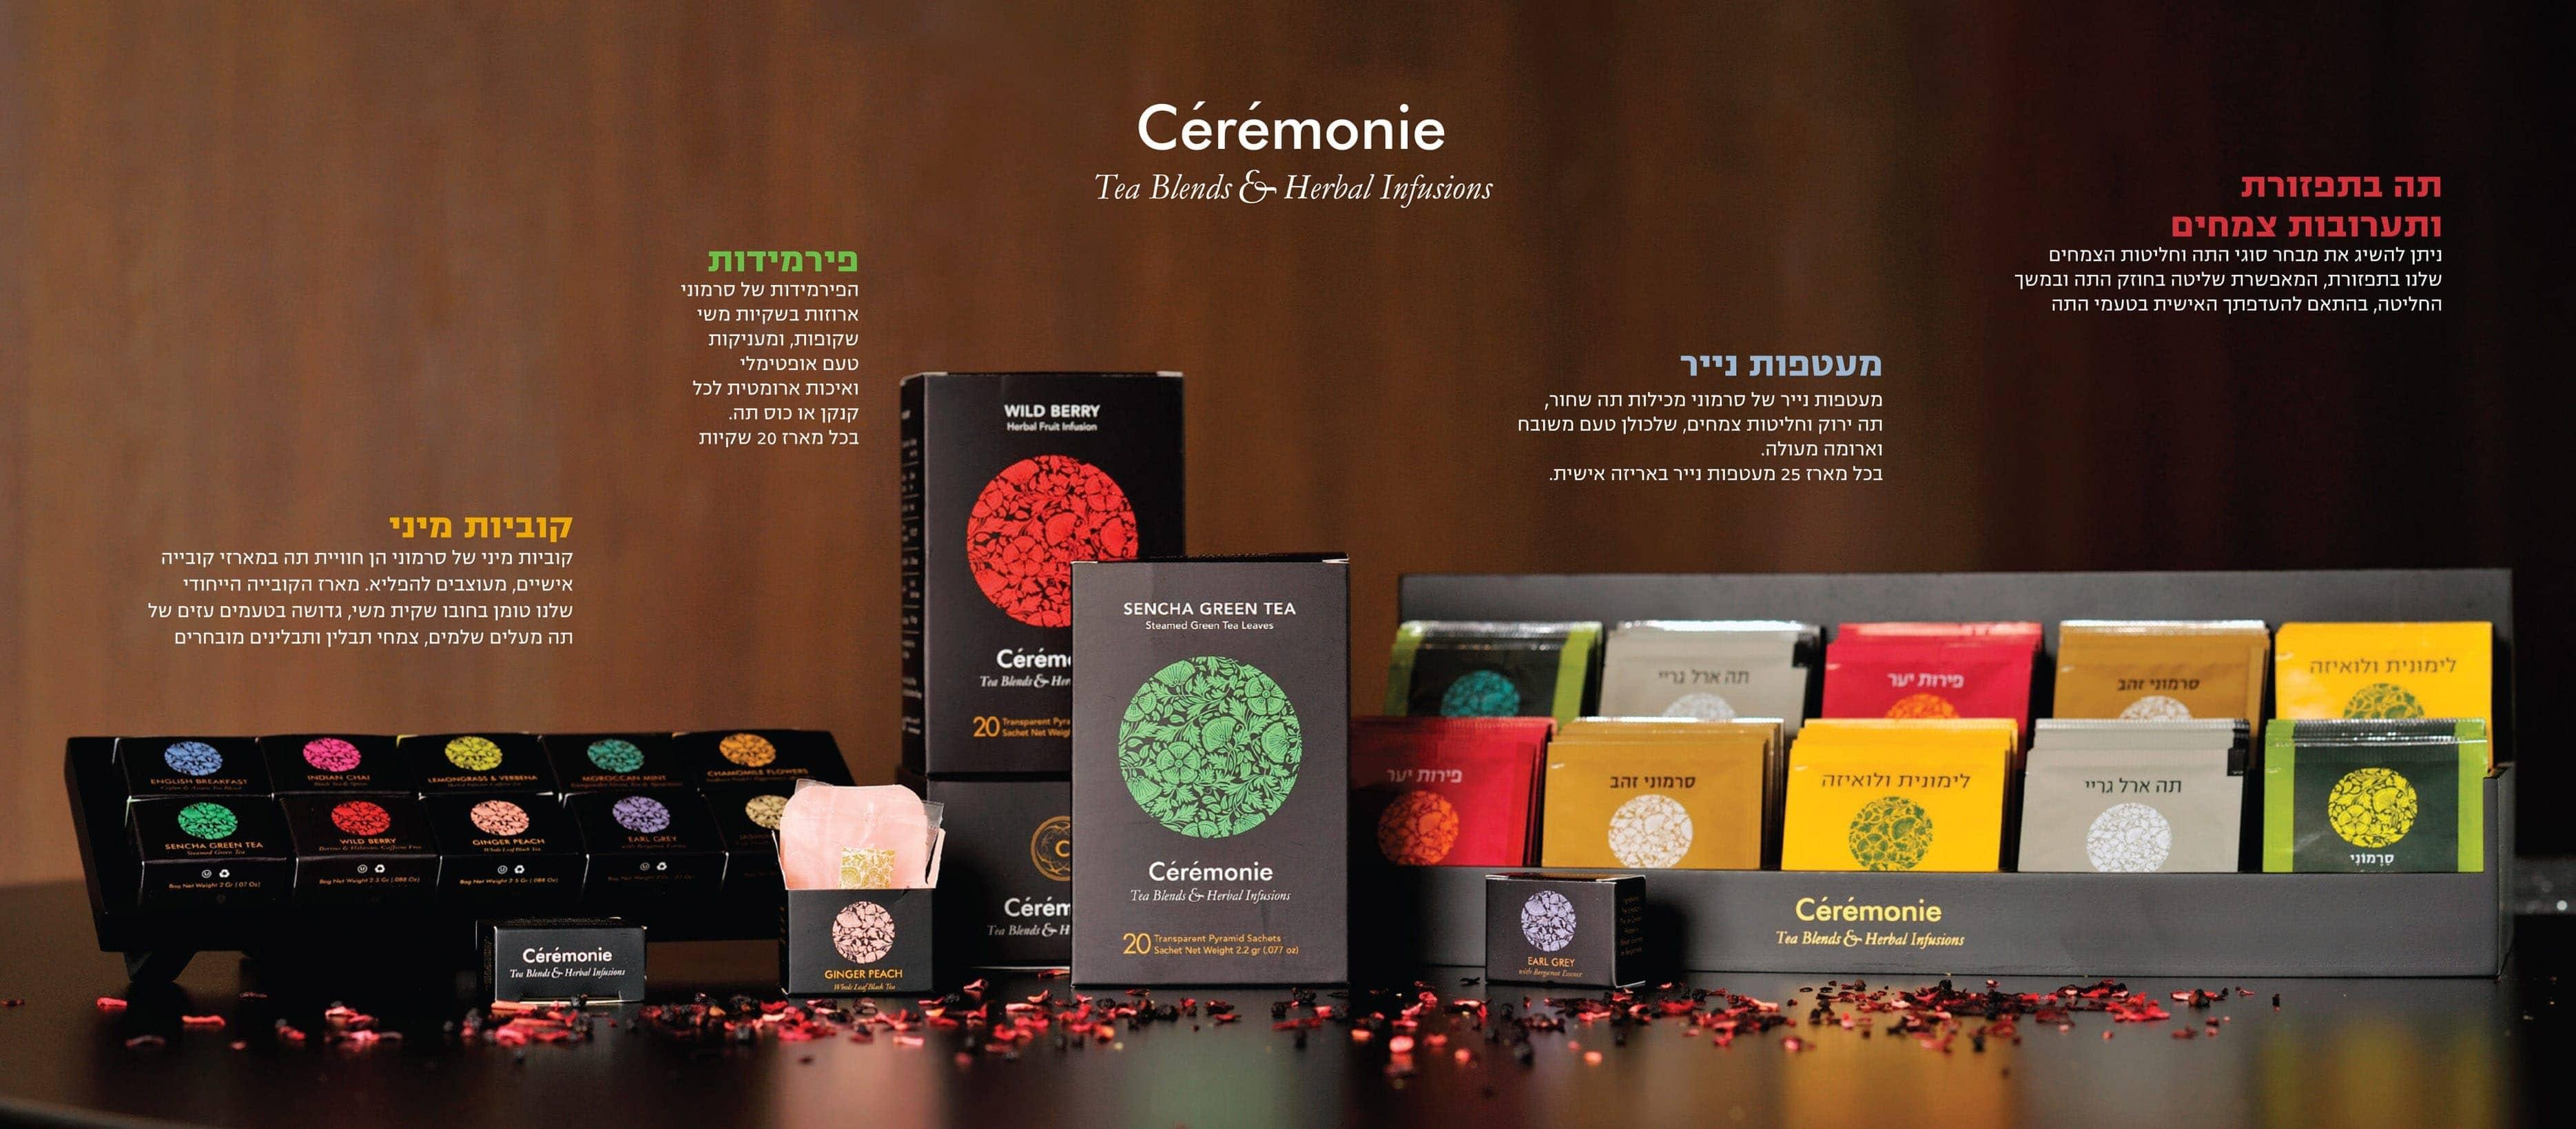 Ceremony Tea Catalog